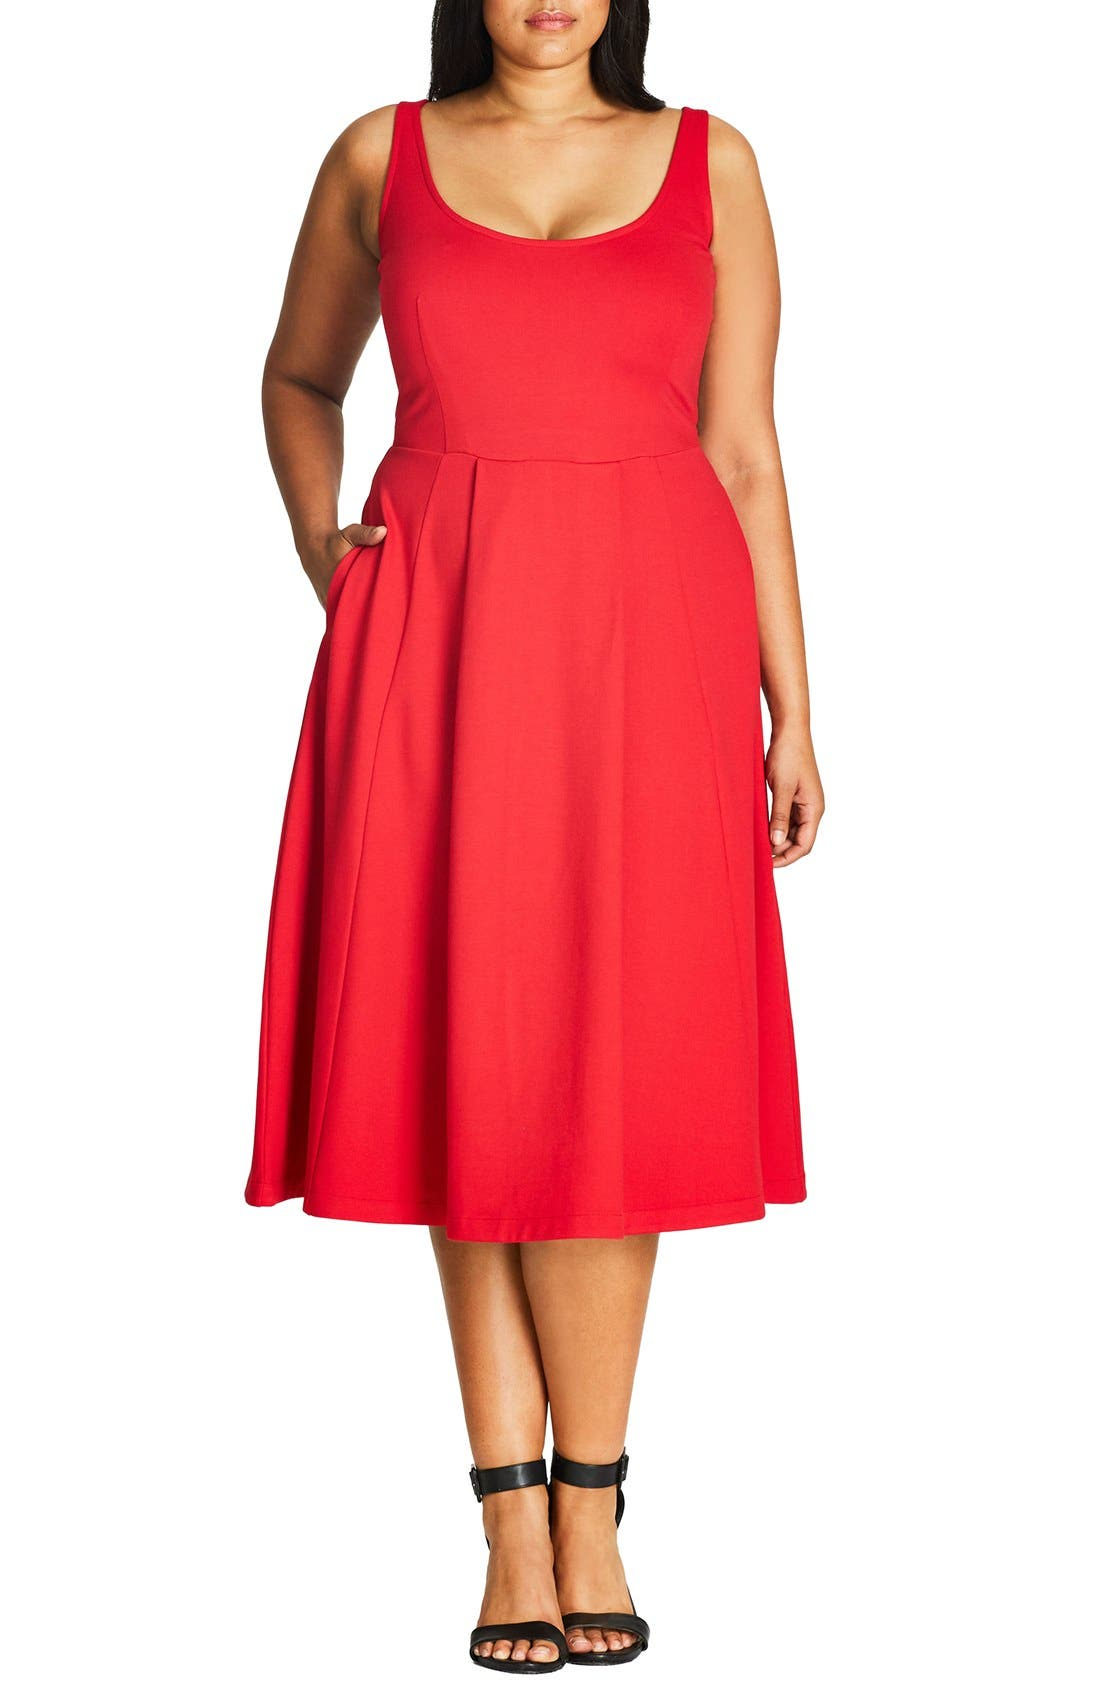 Main Image - City Chic Classic Longline Scoop Neck Midi Dress (Plus Size)